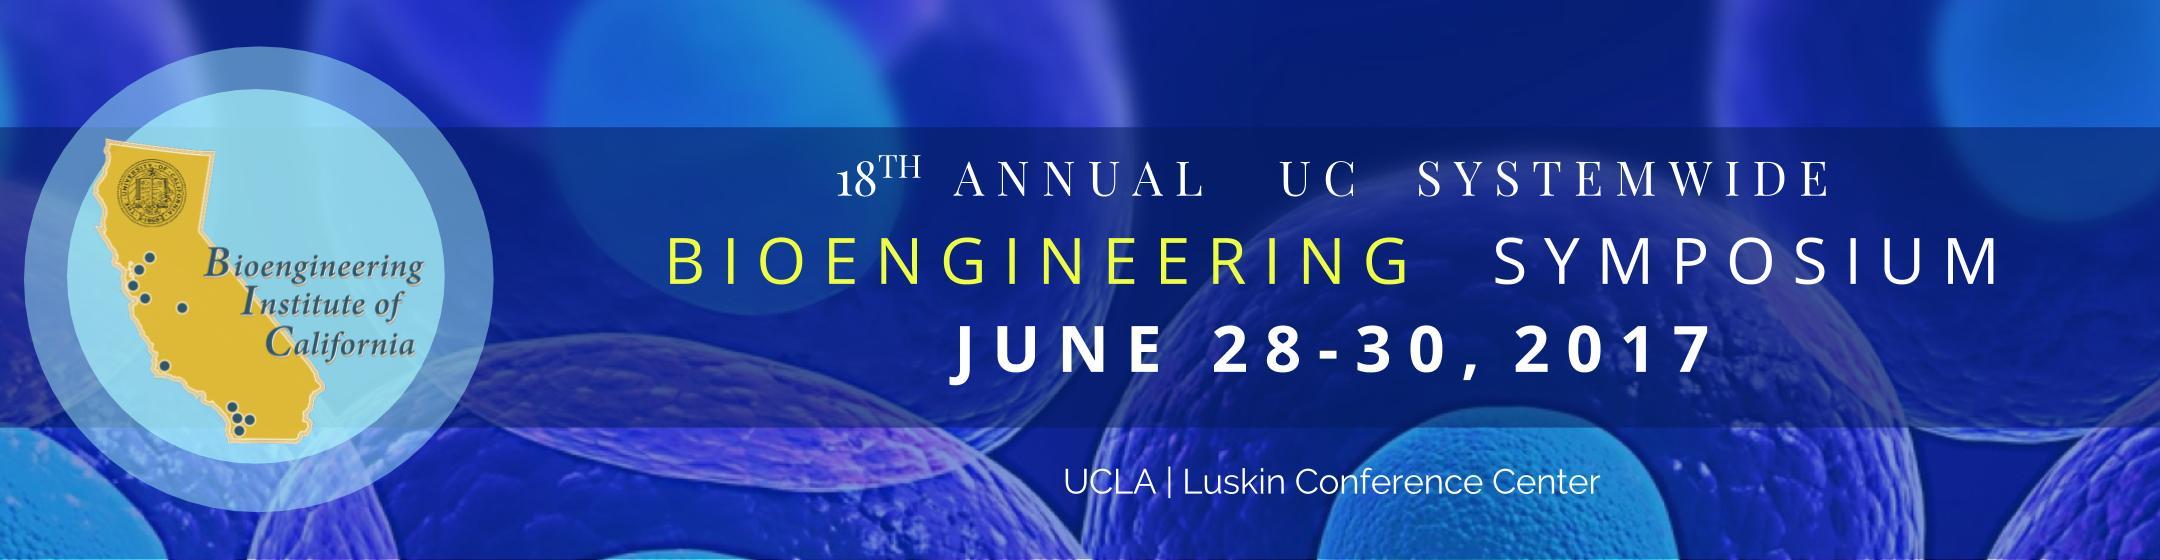 The 18th Annual UC Systemwide Bioengineering Symposium